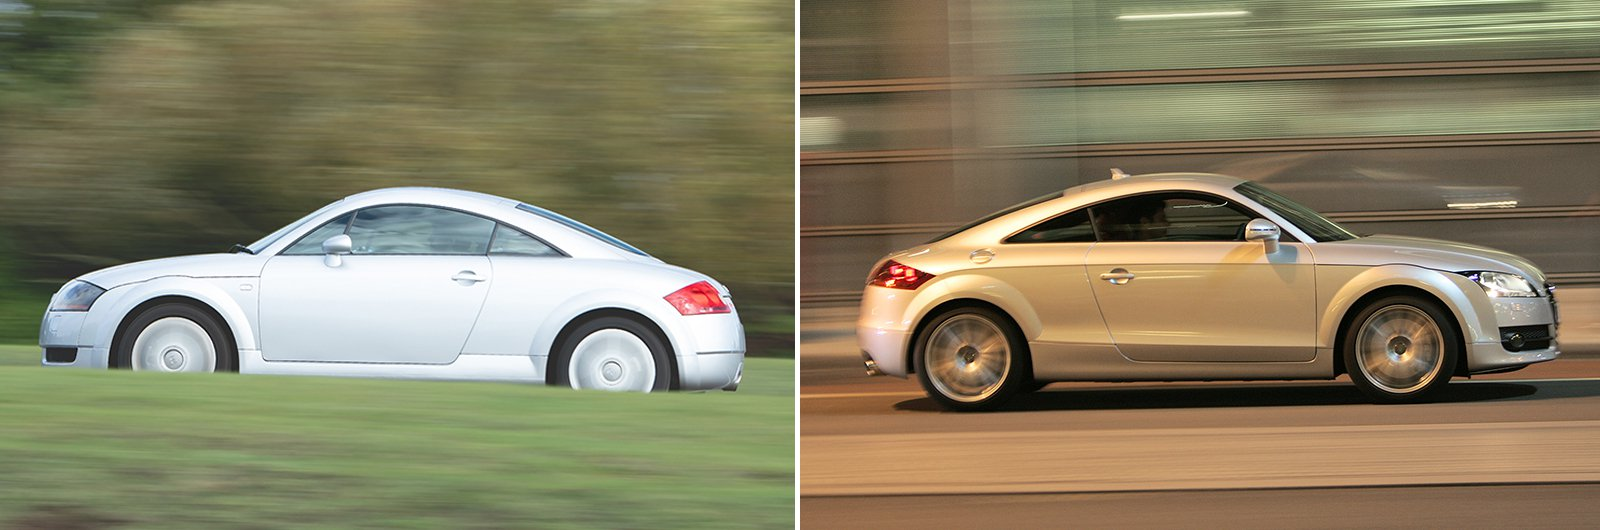 Audi TT MK1 & Mk2